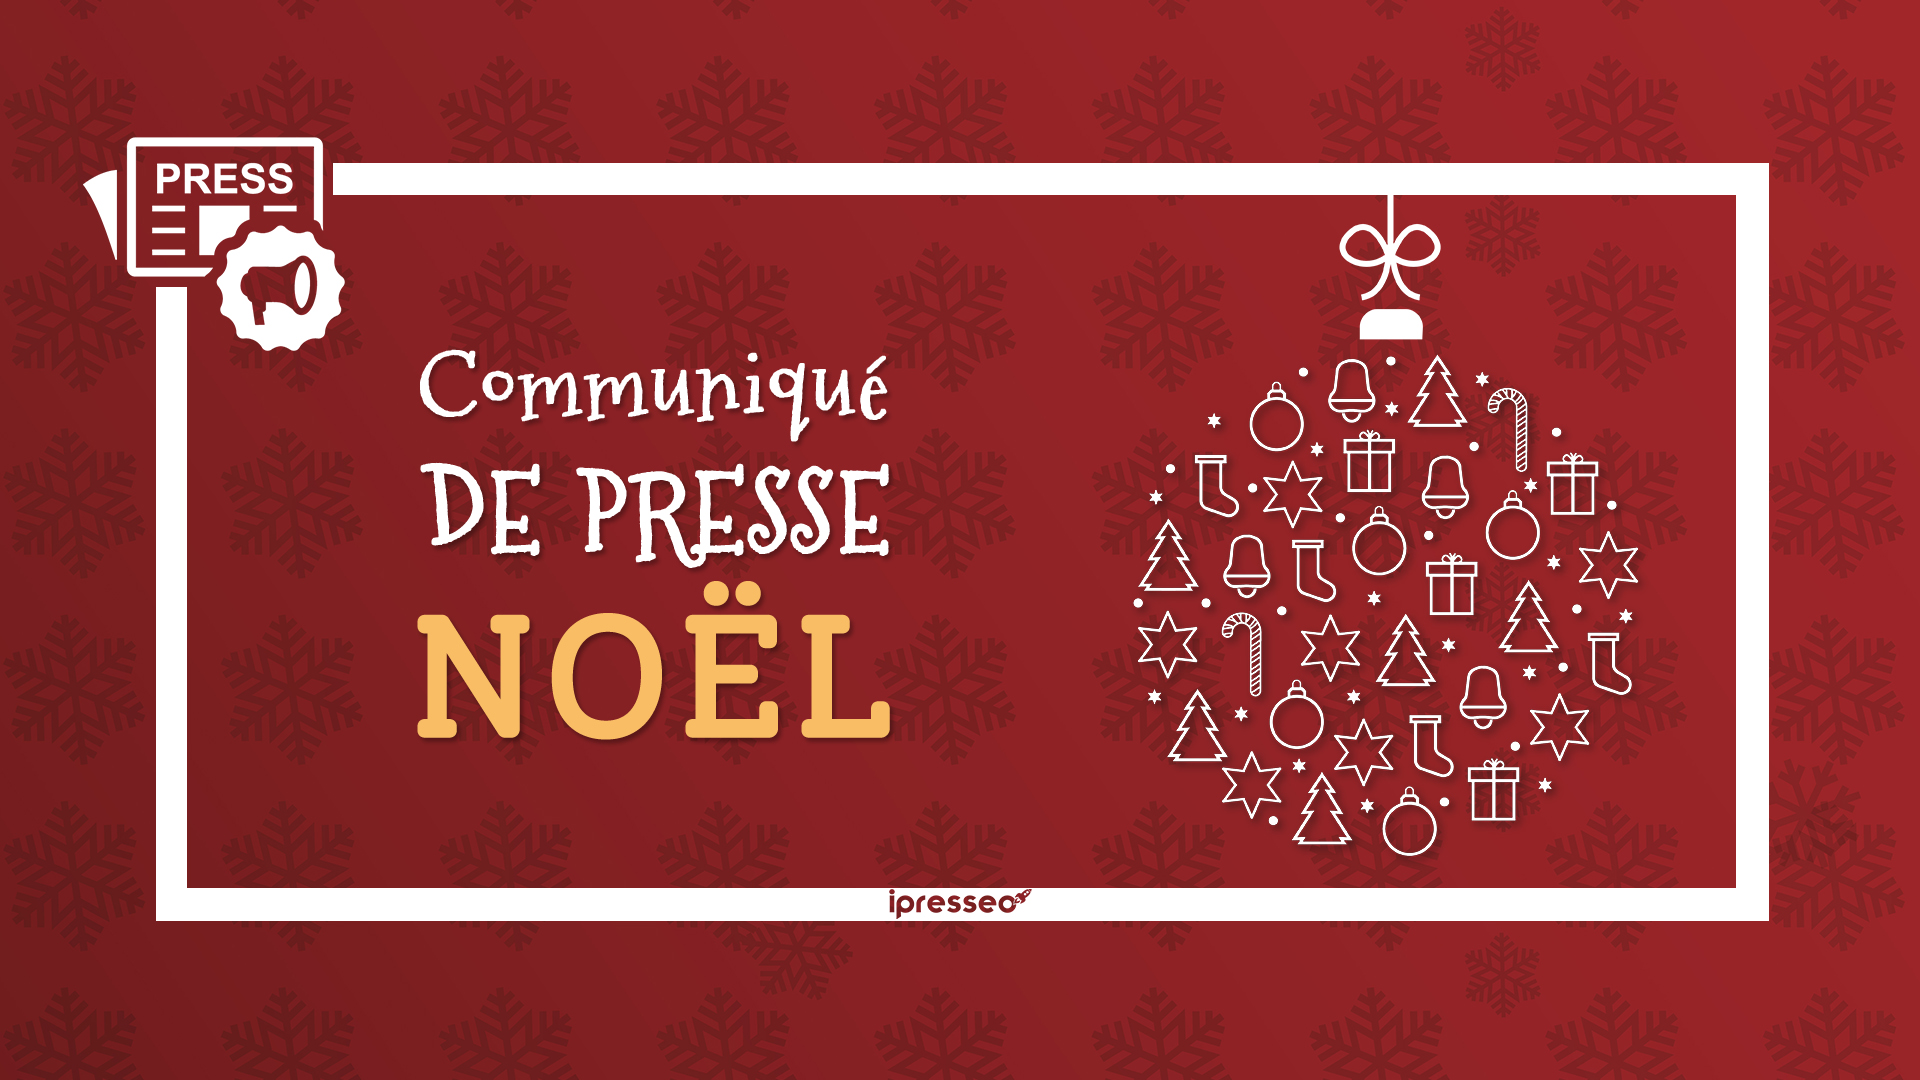 Communiqué de presse Noel